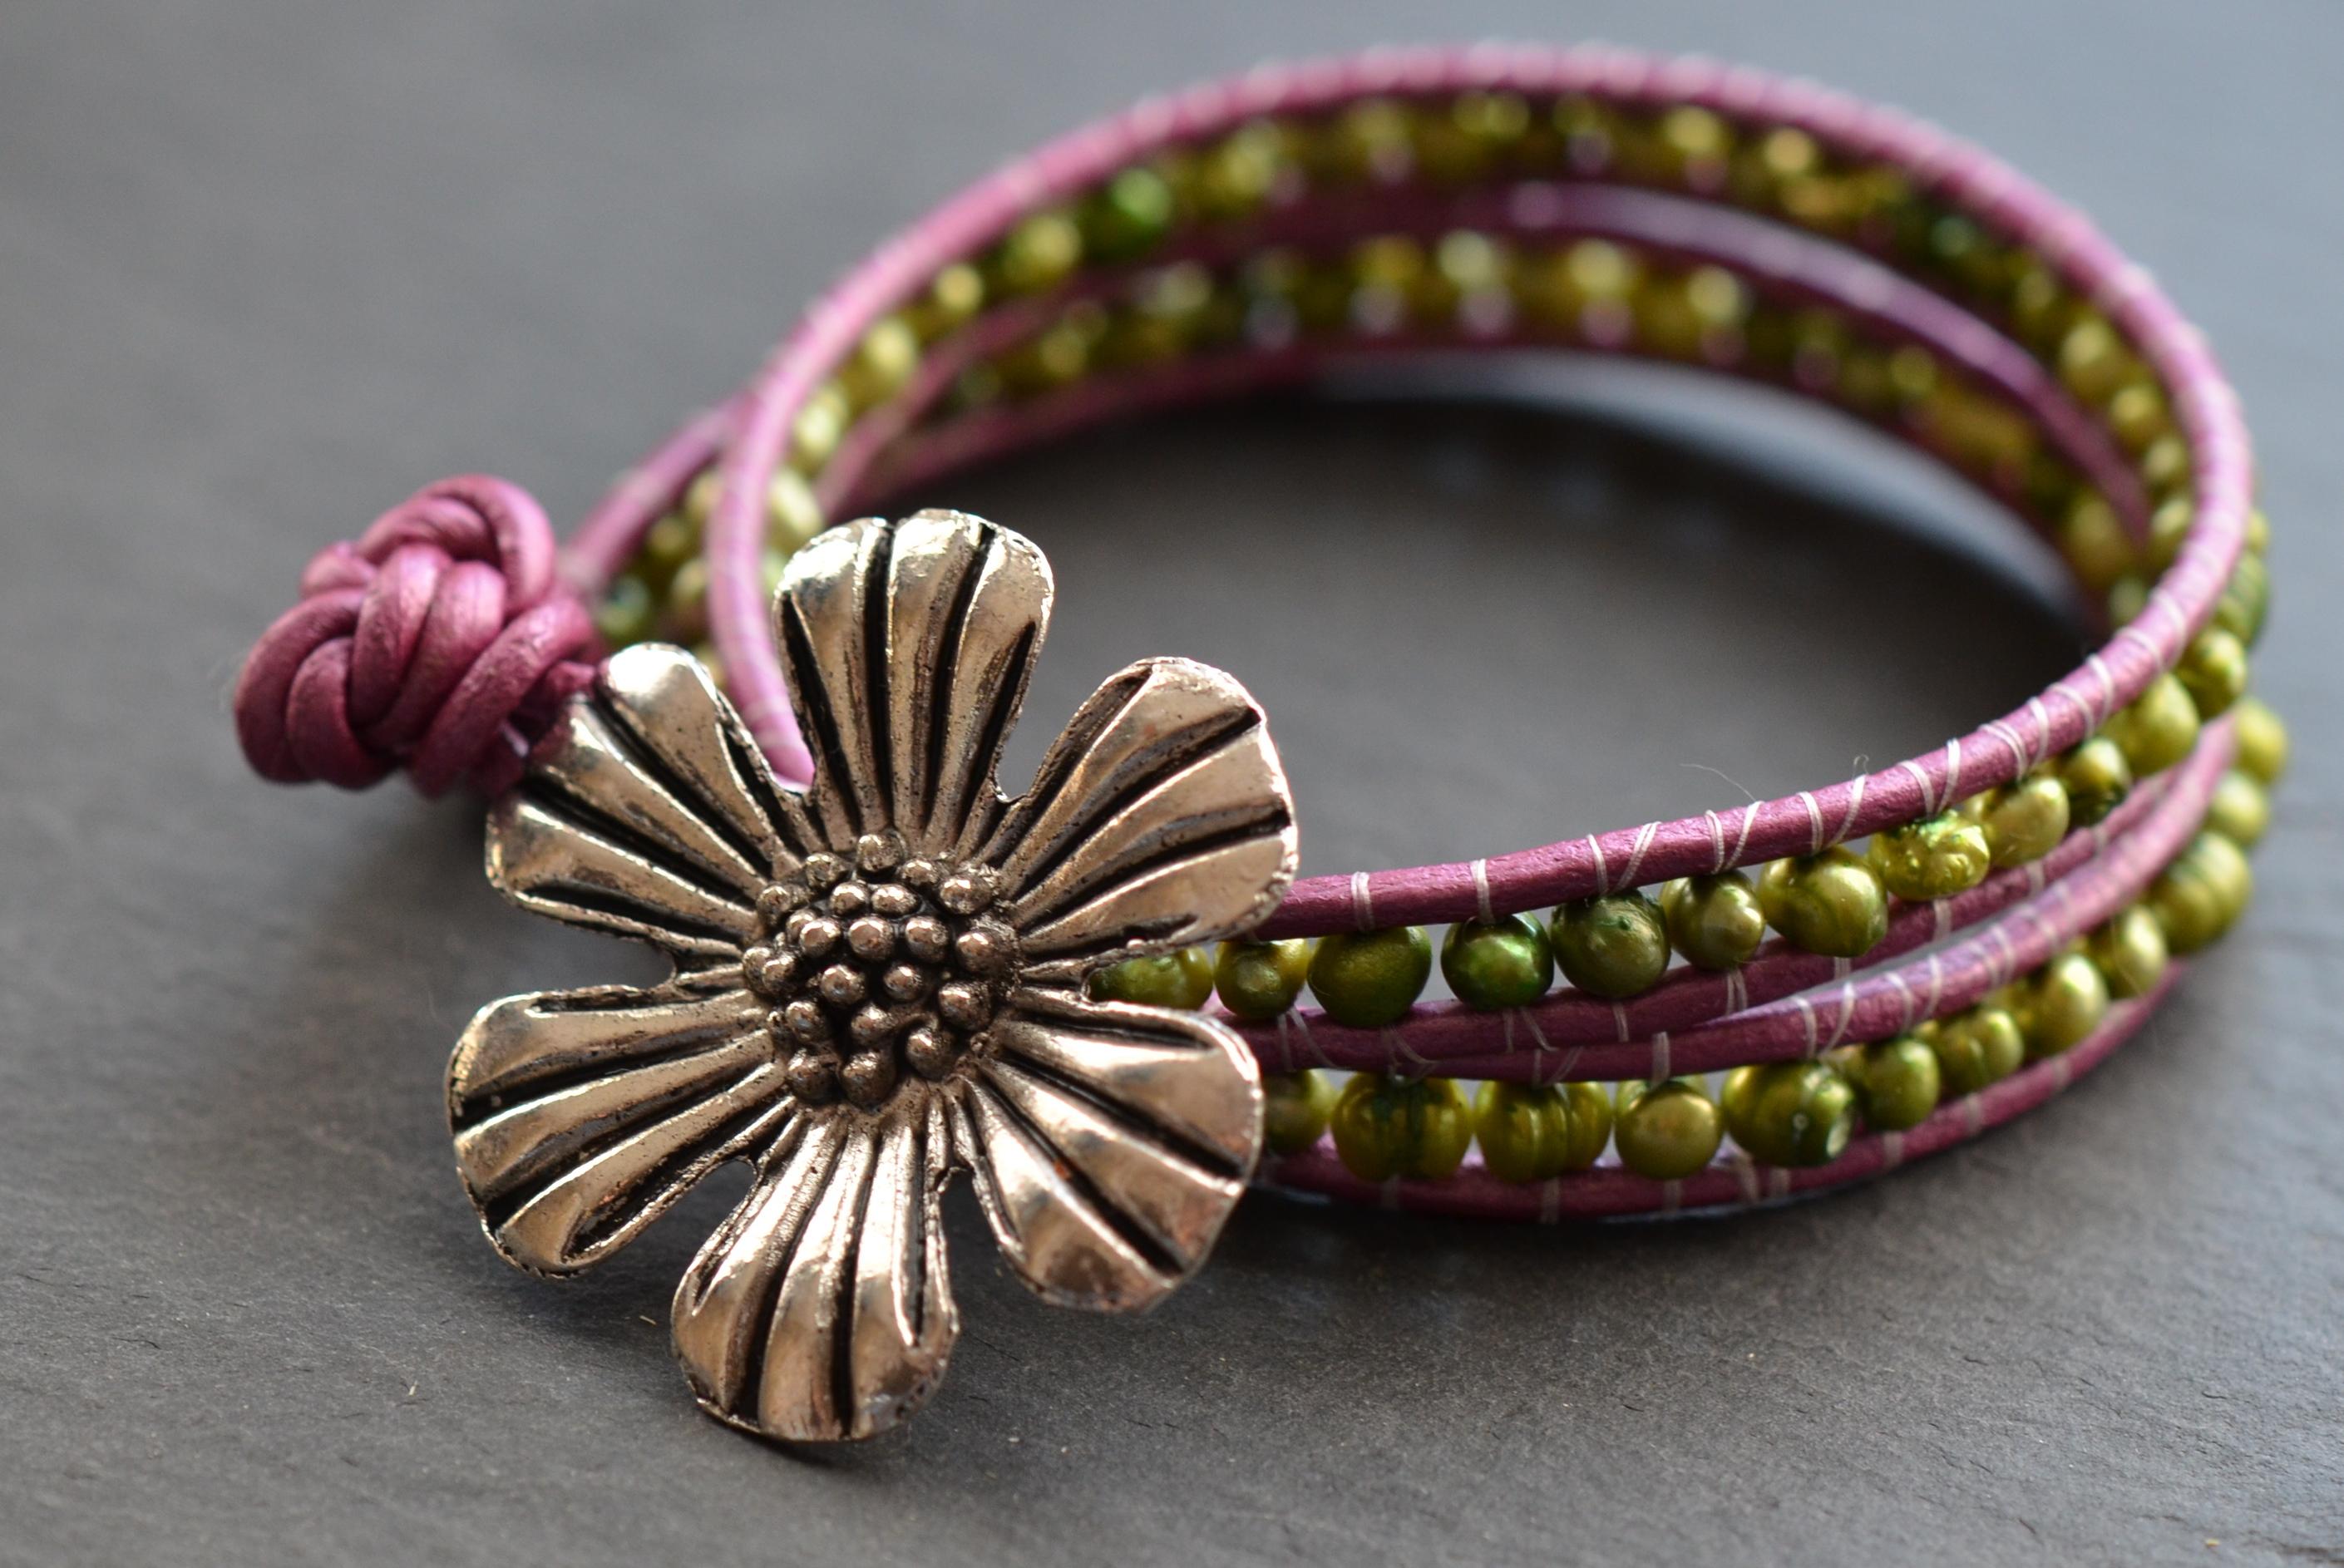 Daisy Beaded Pearl Leather Wrap Bracelet Handmade By Gypsy Green Creations